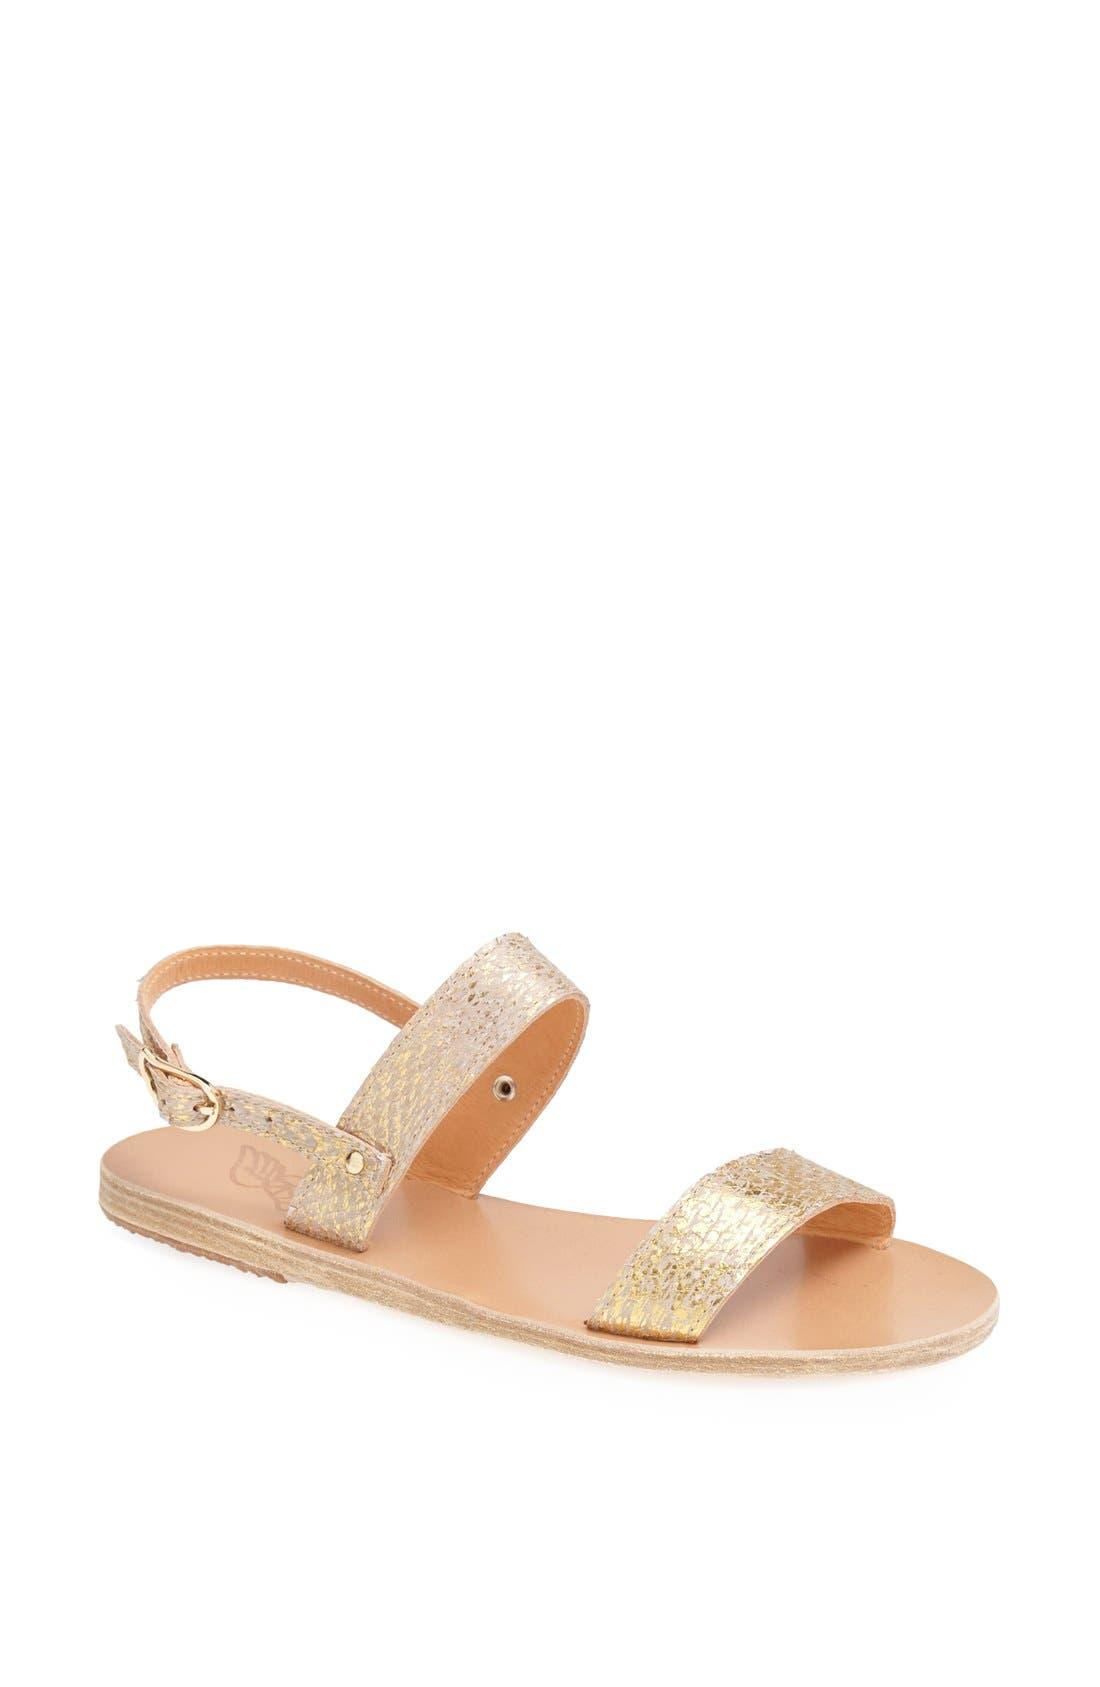 Alternate Image 1 Selected - Ancient Greek Sandals 'Clio' Metallic Salmon Skin Sandal